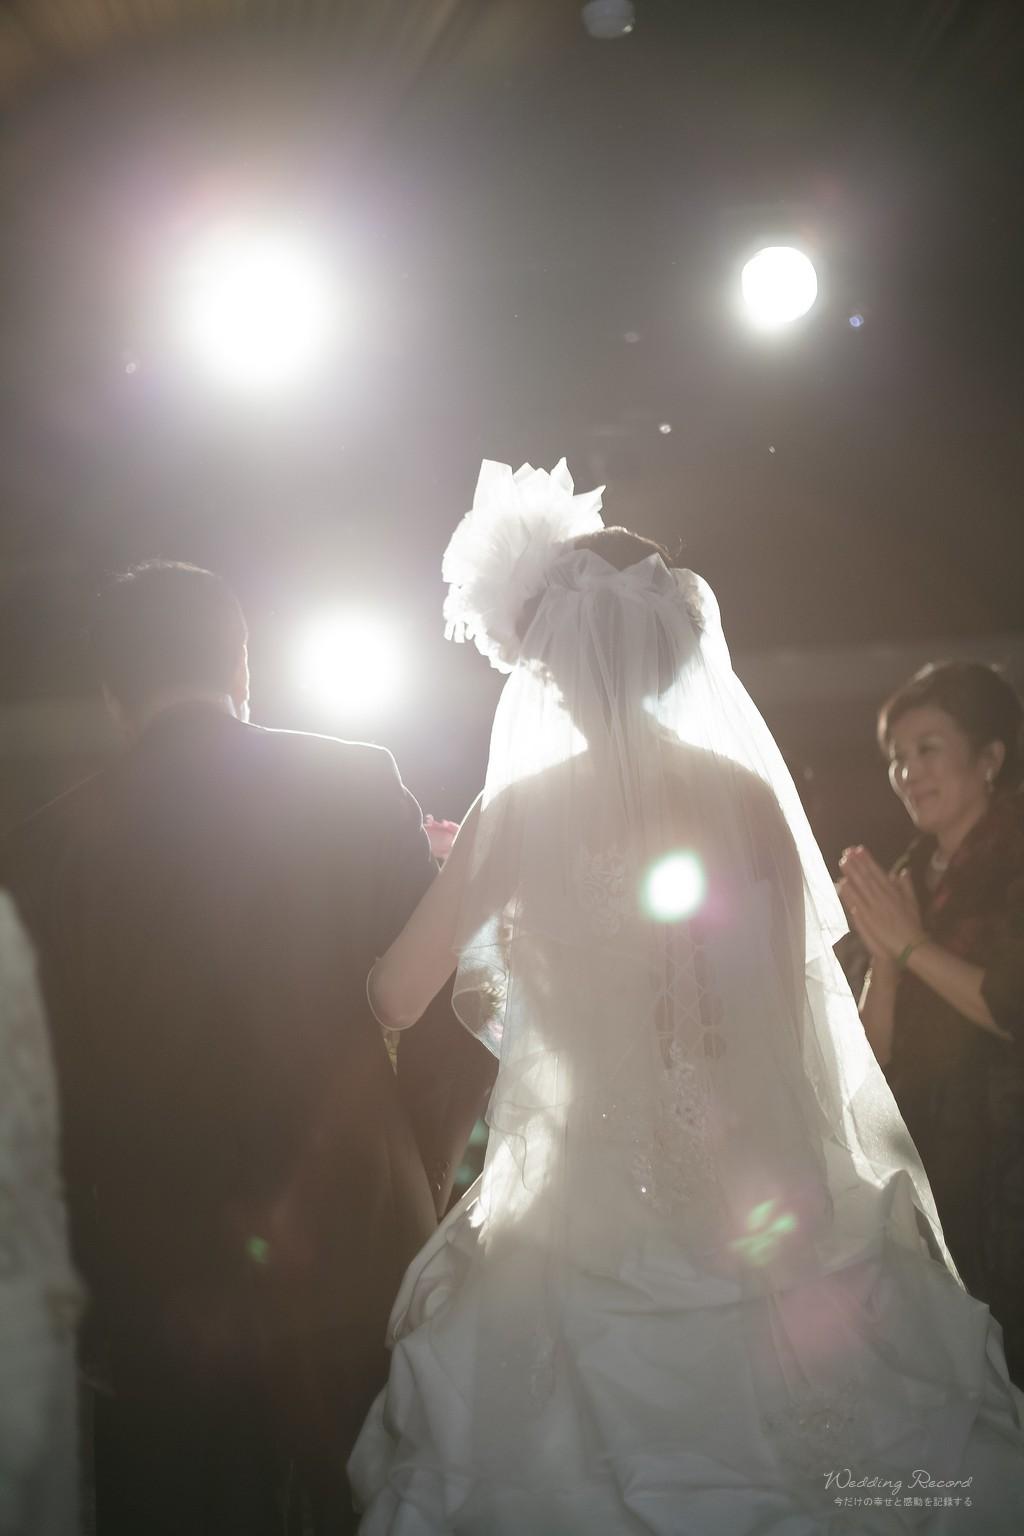 7060571731_d3f4a2da35_o-法豆影像工作室_婚攝, 婚禮攝影, 婚禮紀錄, 婚紗攝影, 自助婚紗, 婚攝推薦, 攝影棚出租, 攝影棚租借, 孕婦禮服出租, 孕婦禮服租借, CEO專業形象照, 形像照, 型像照, 型象照. 形象照團拍, 全家福, 全家福團拍, 招團, 揪團拍, 親子寫真, 家庭寫真, 抓周, 抓周團拍